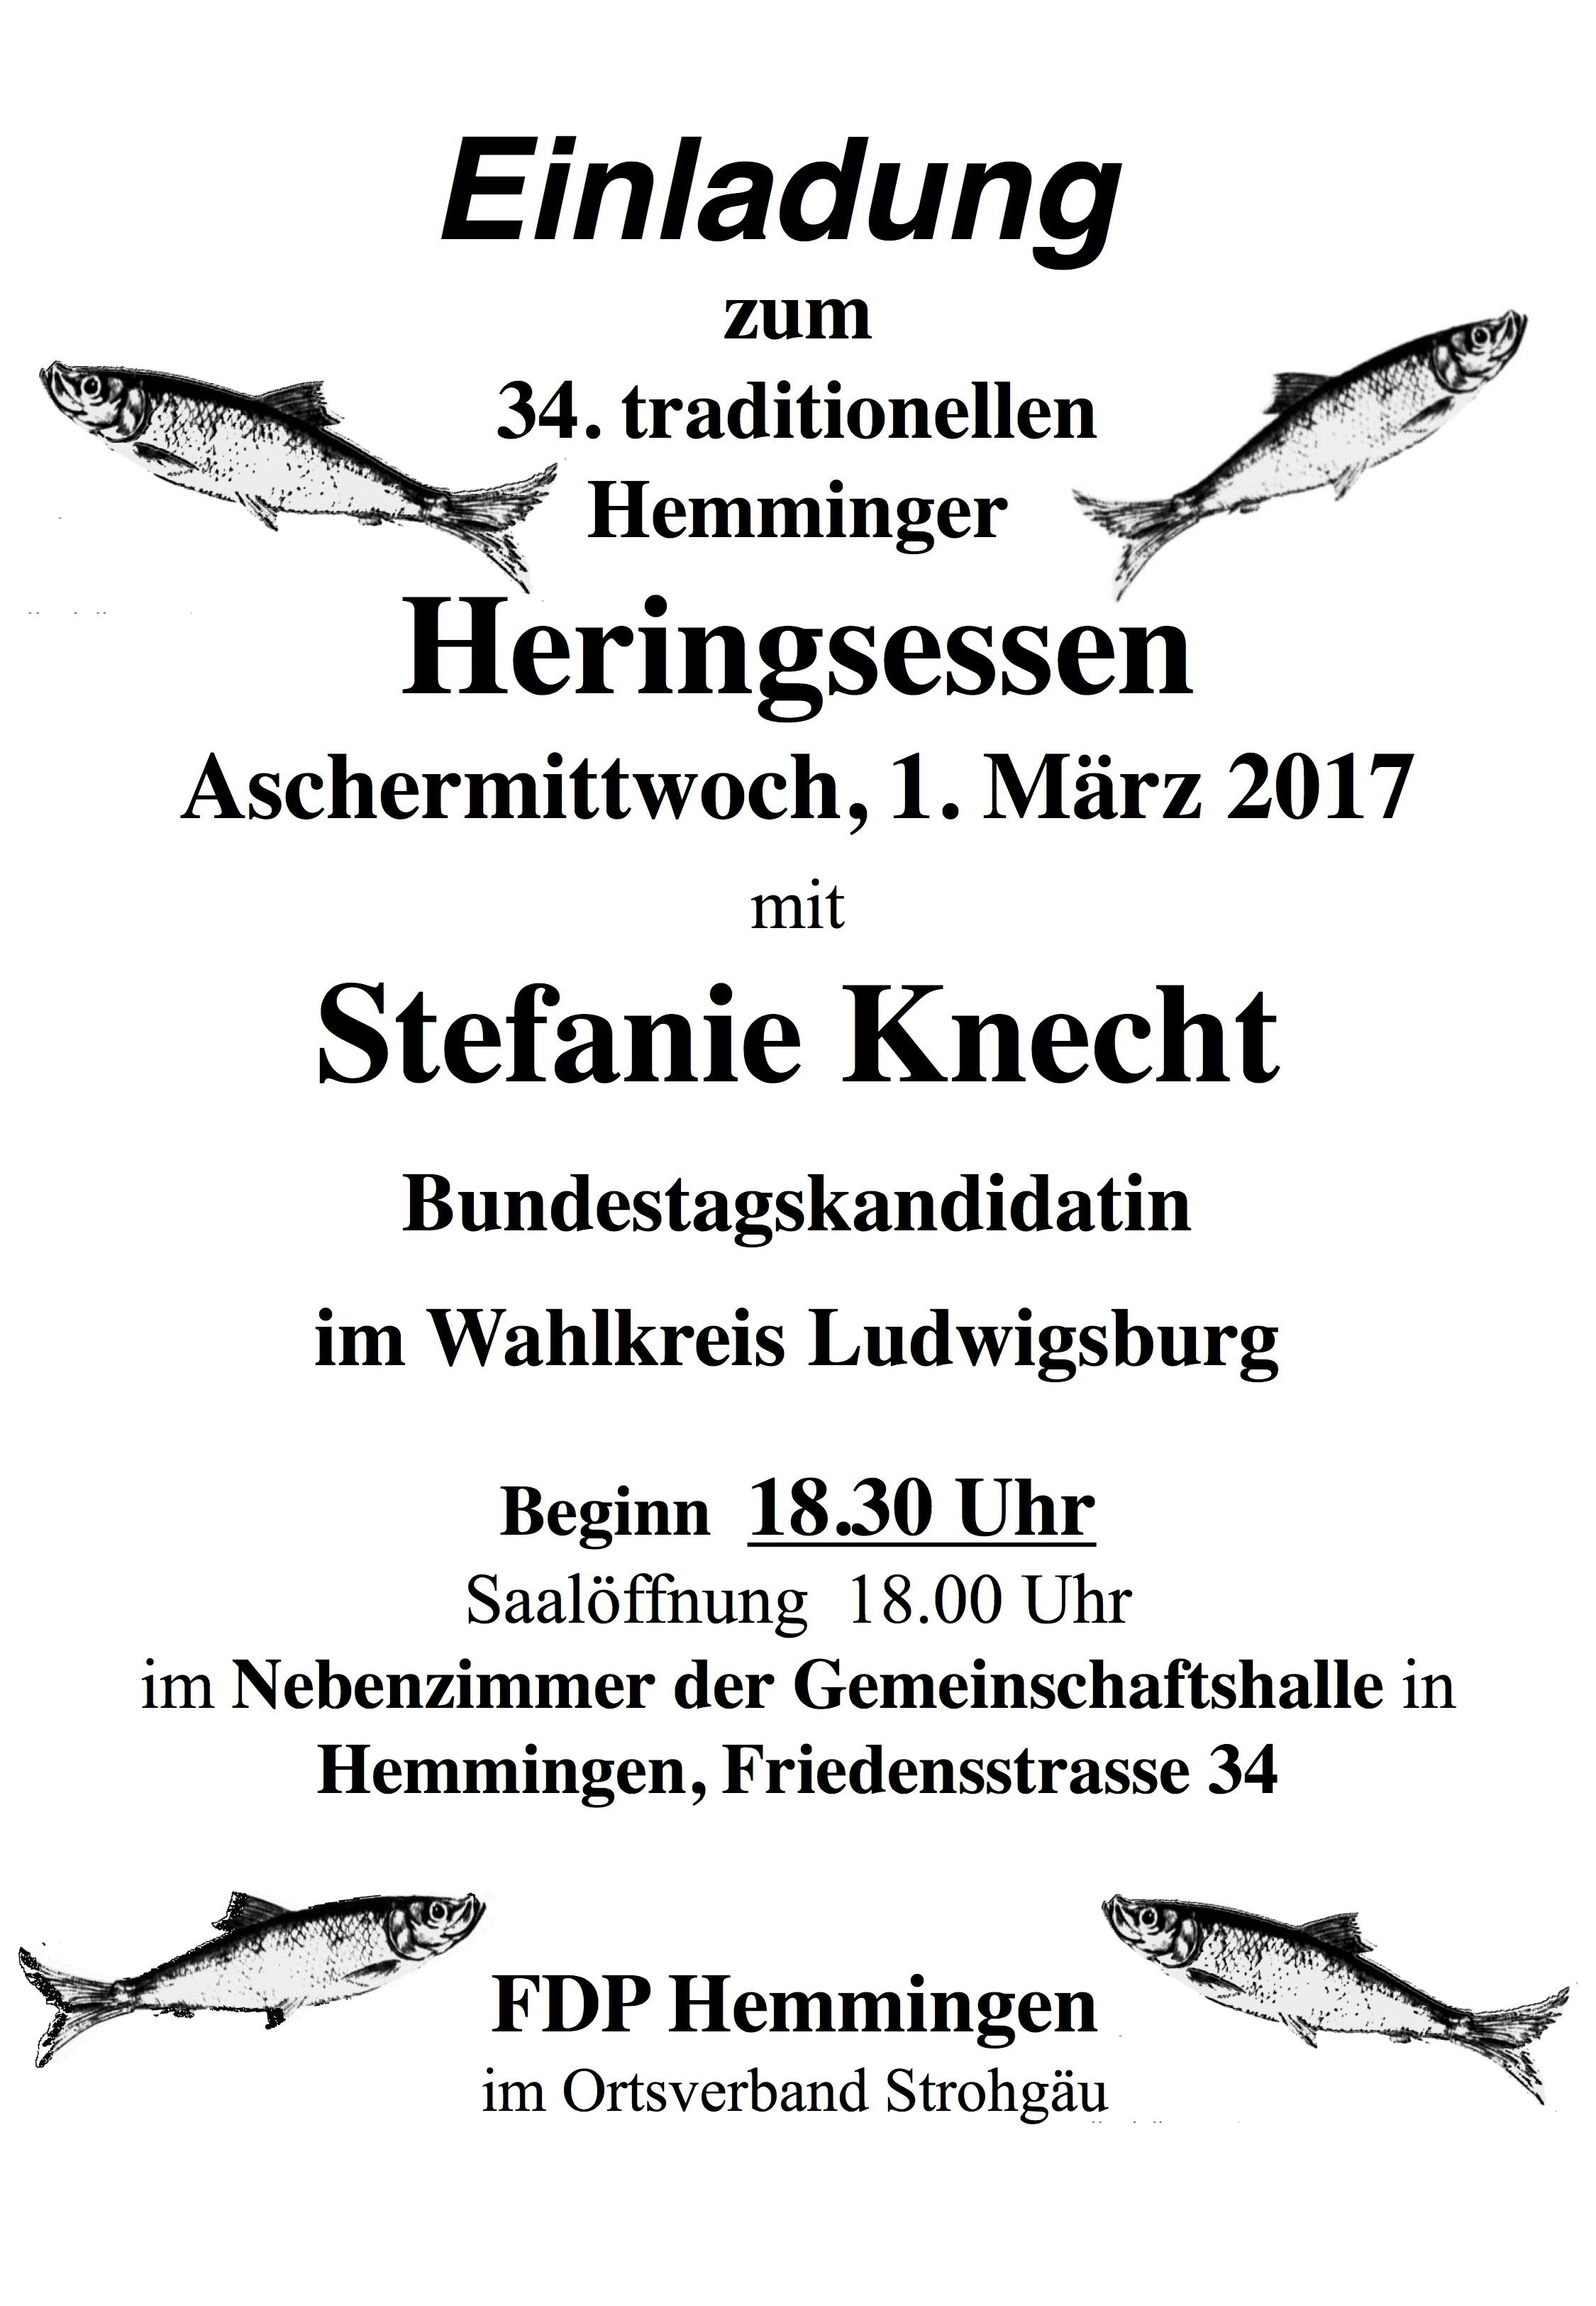 Einladung Heringsessen 2017